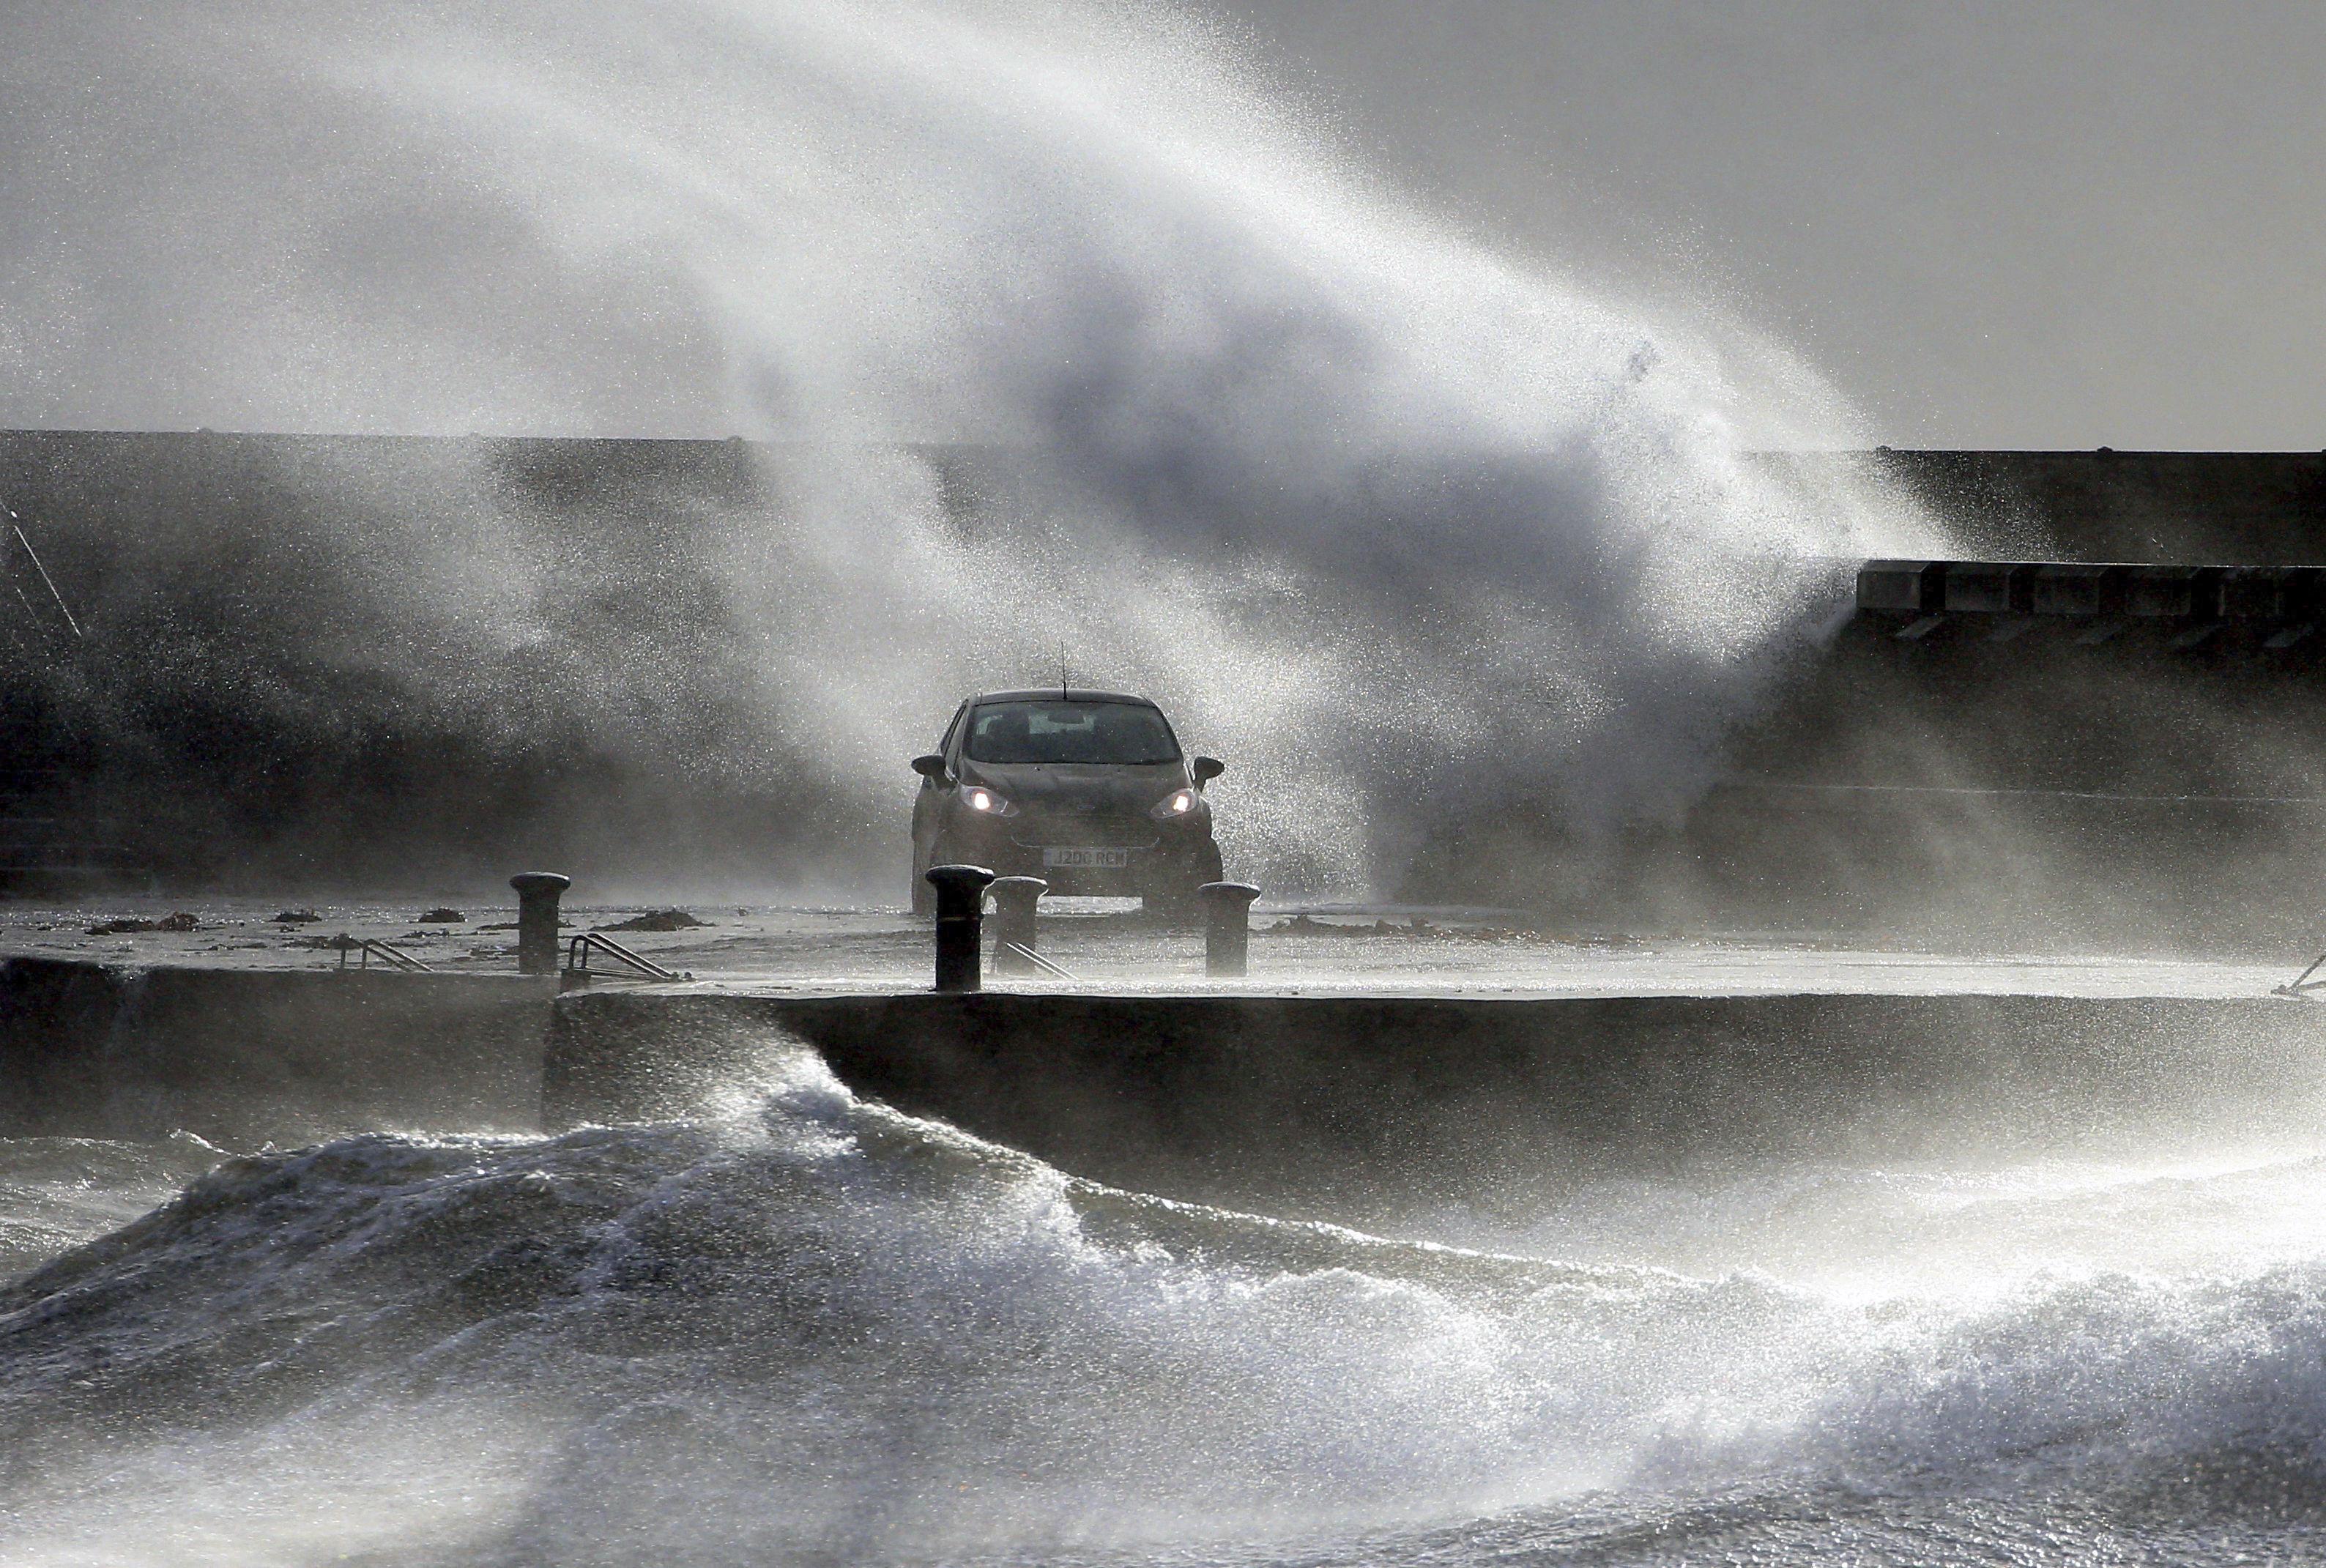 Waves lash the coast on the Ayrshire coast at Ardrossan, Scotland, on Feb. 9, 2020.